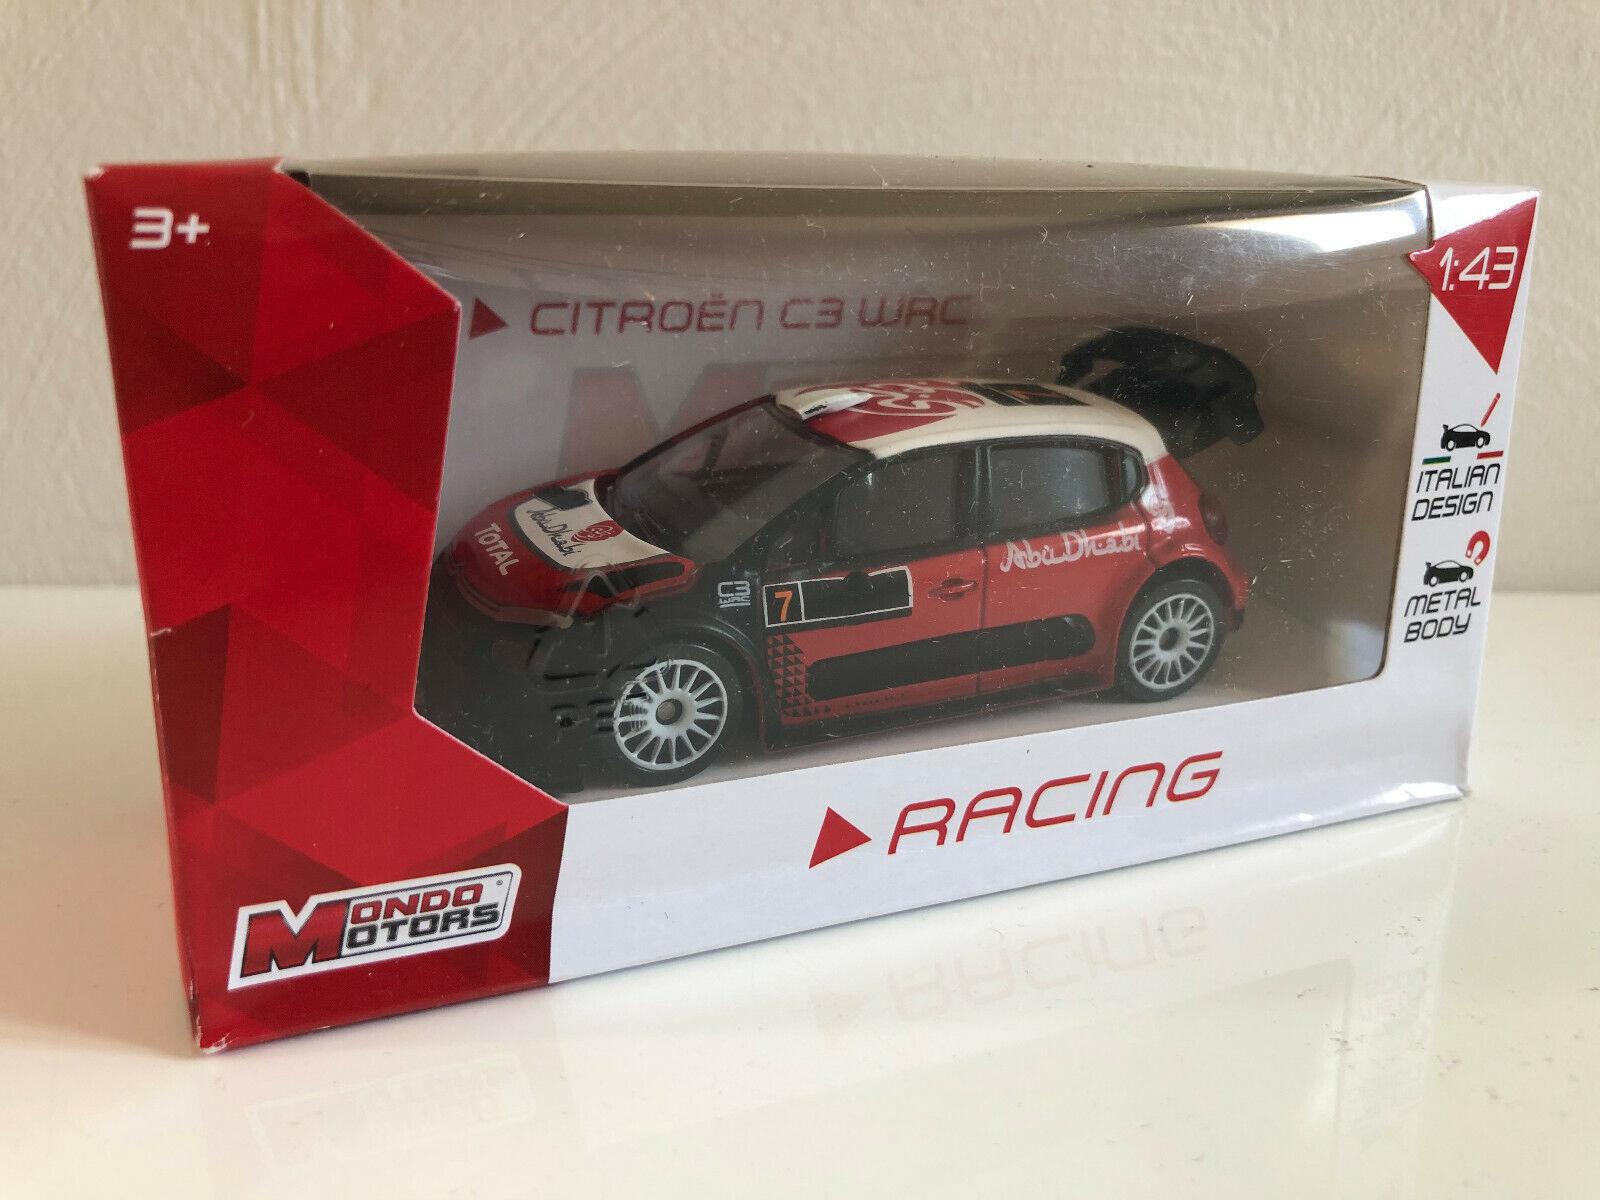 Voiture Miniature Racing Citroën C3 Wrc 1 43 Collection Neuf